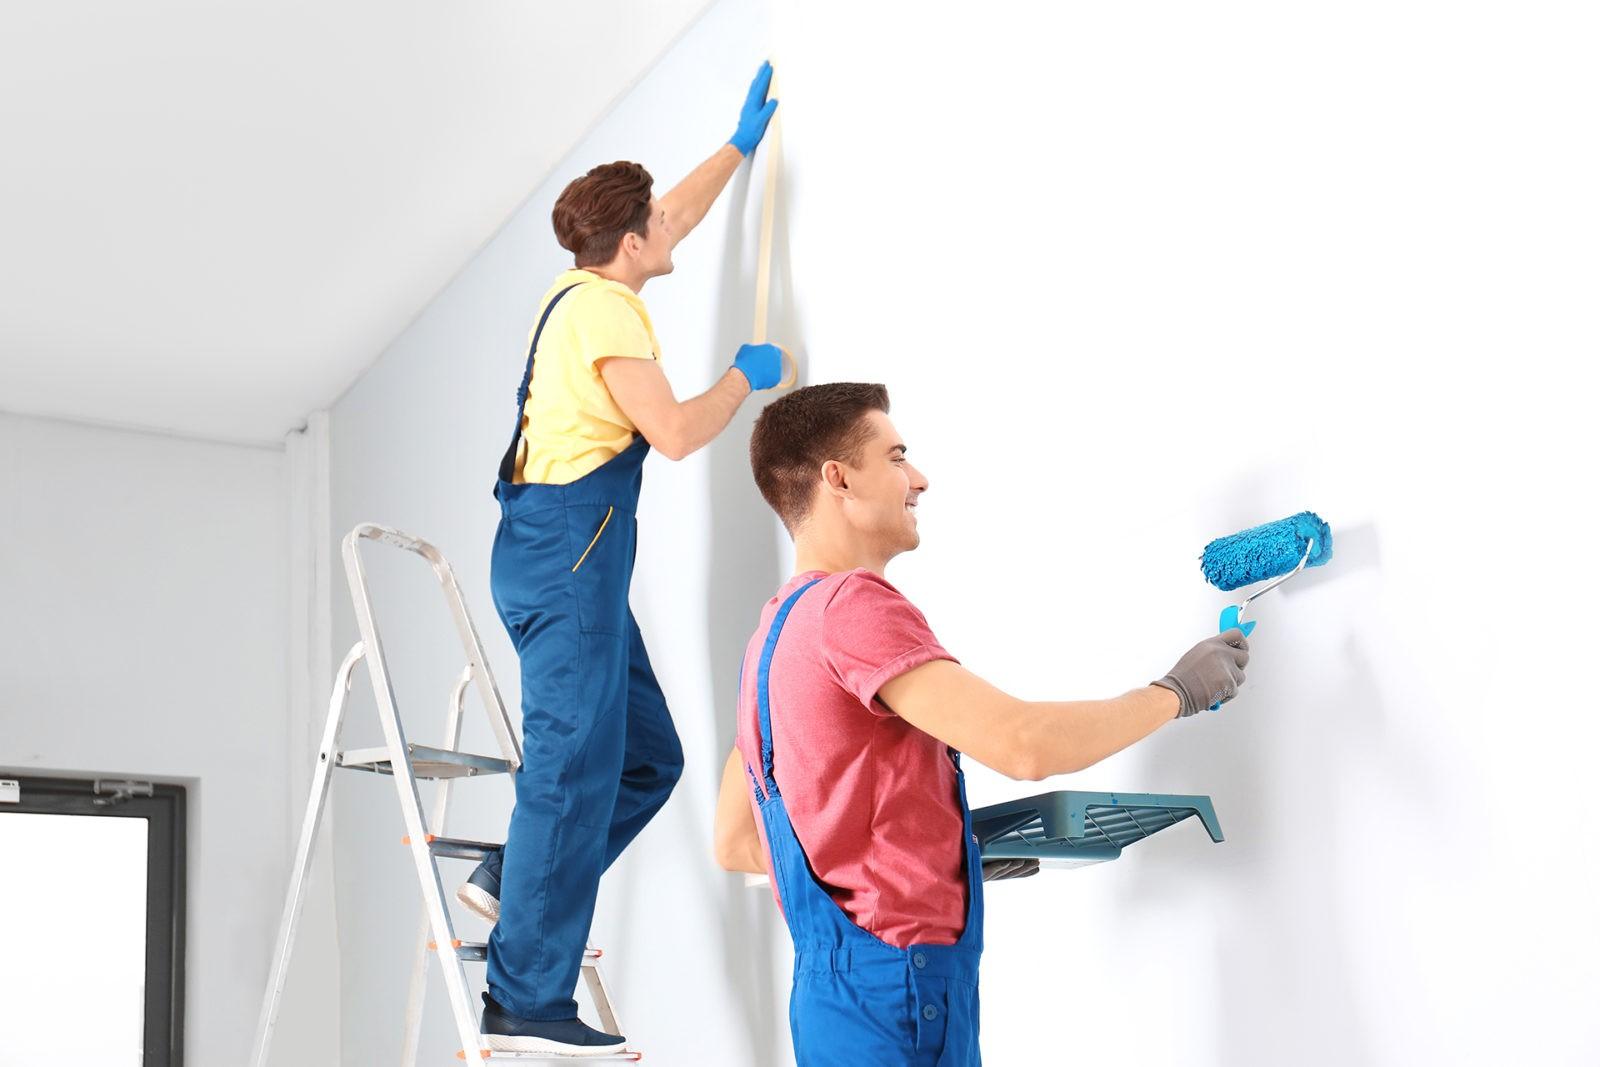 Male decorators refurbishing empty room